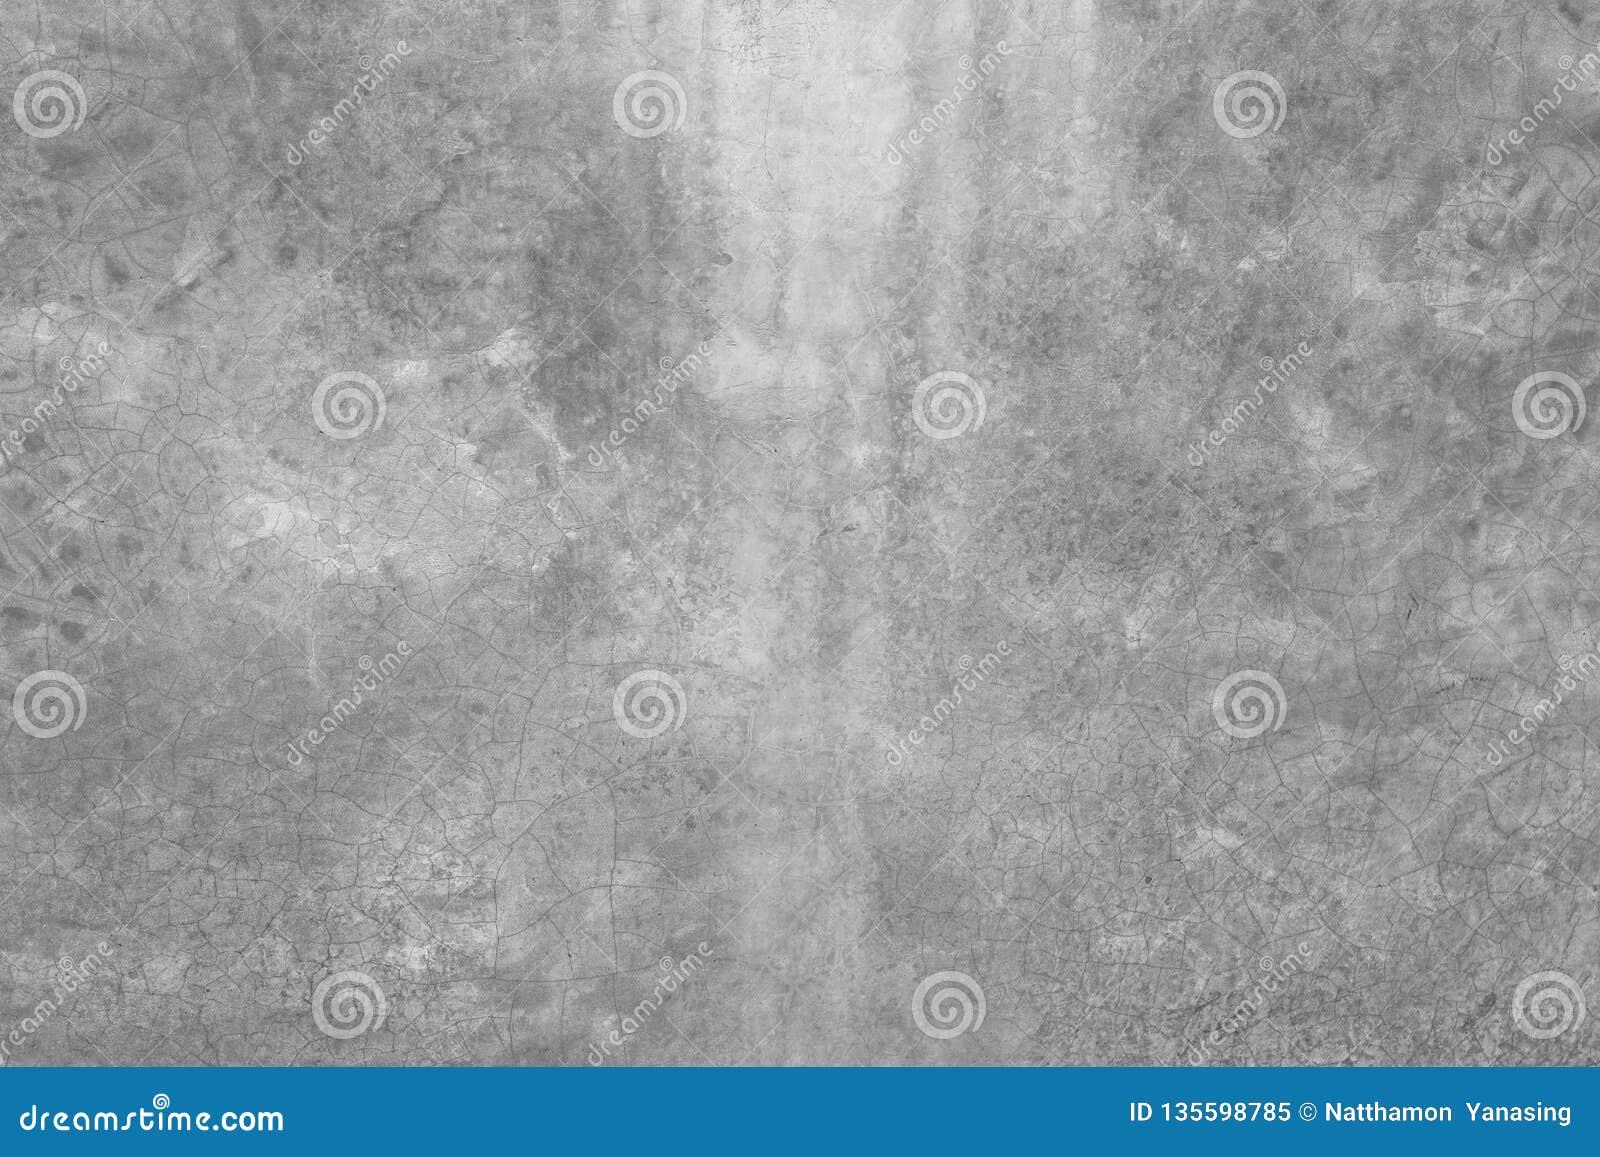 Бетон произведения бетон лексическое значение